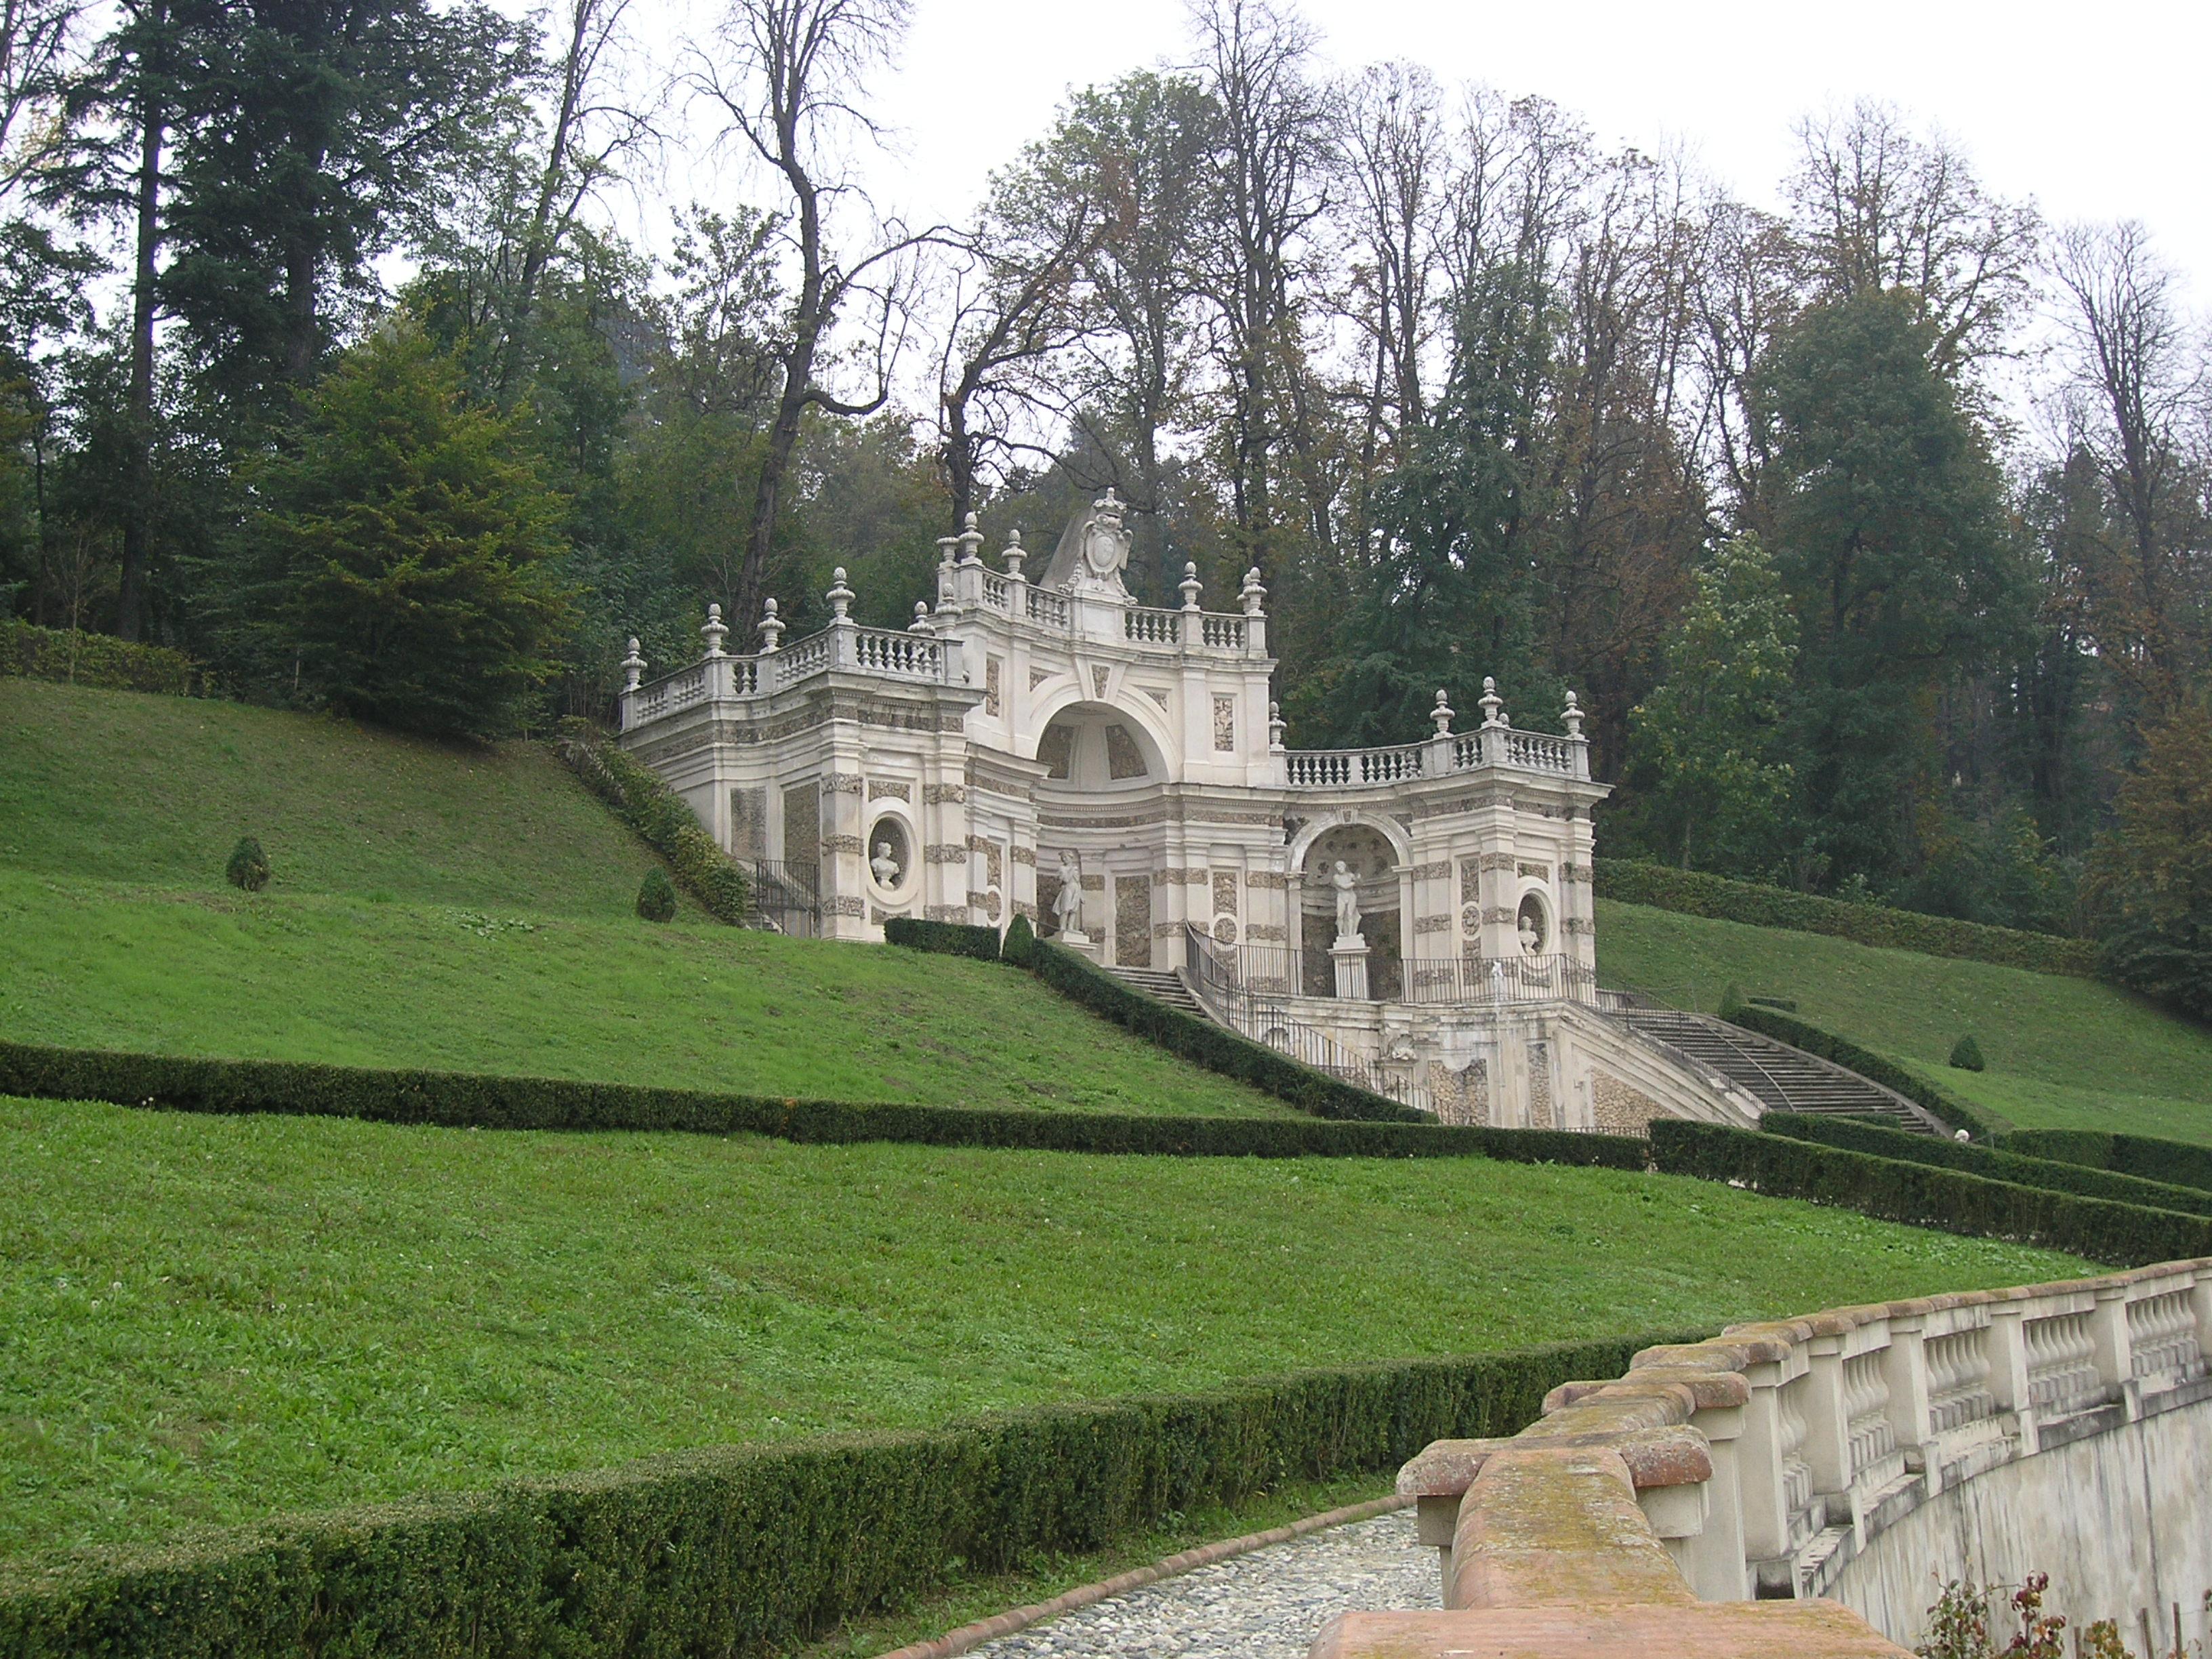 Weekend a Torino: all'aria aperta tra sagre e fiere